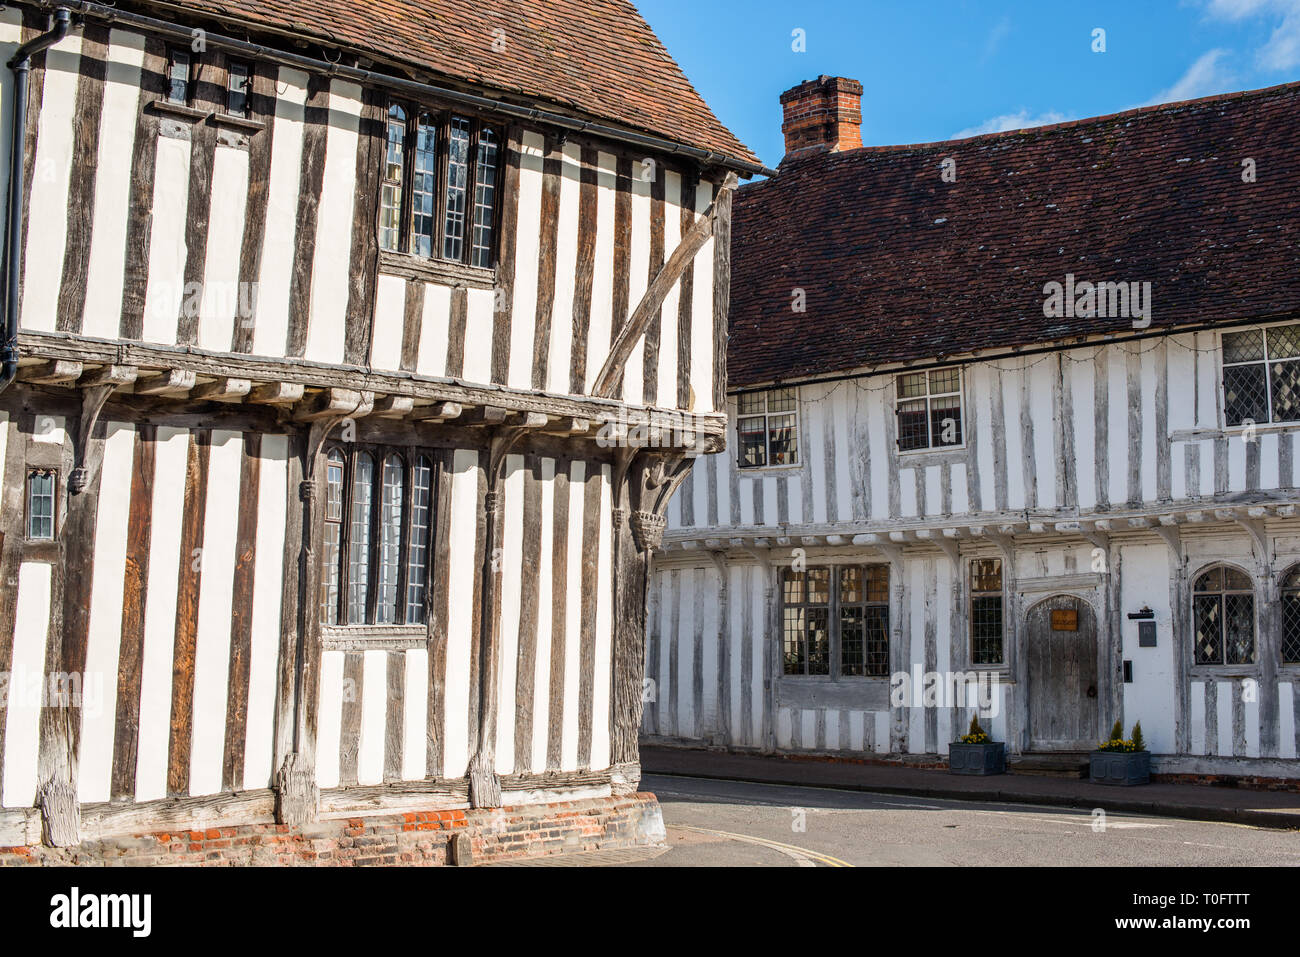 Corner of Water Street and Lady Street, Lavenham, Suffolk, England, United Kingdom, Europe. - Stock Image